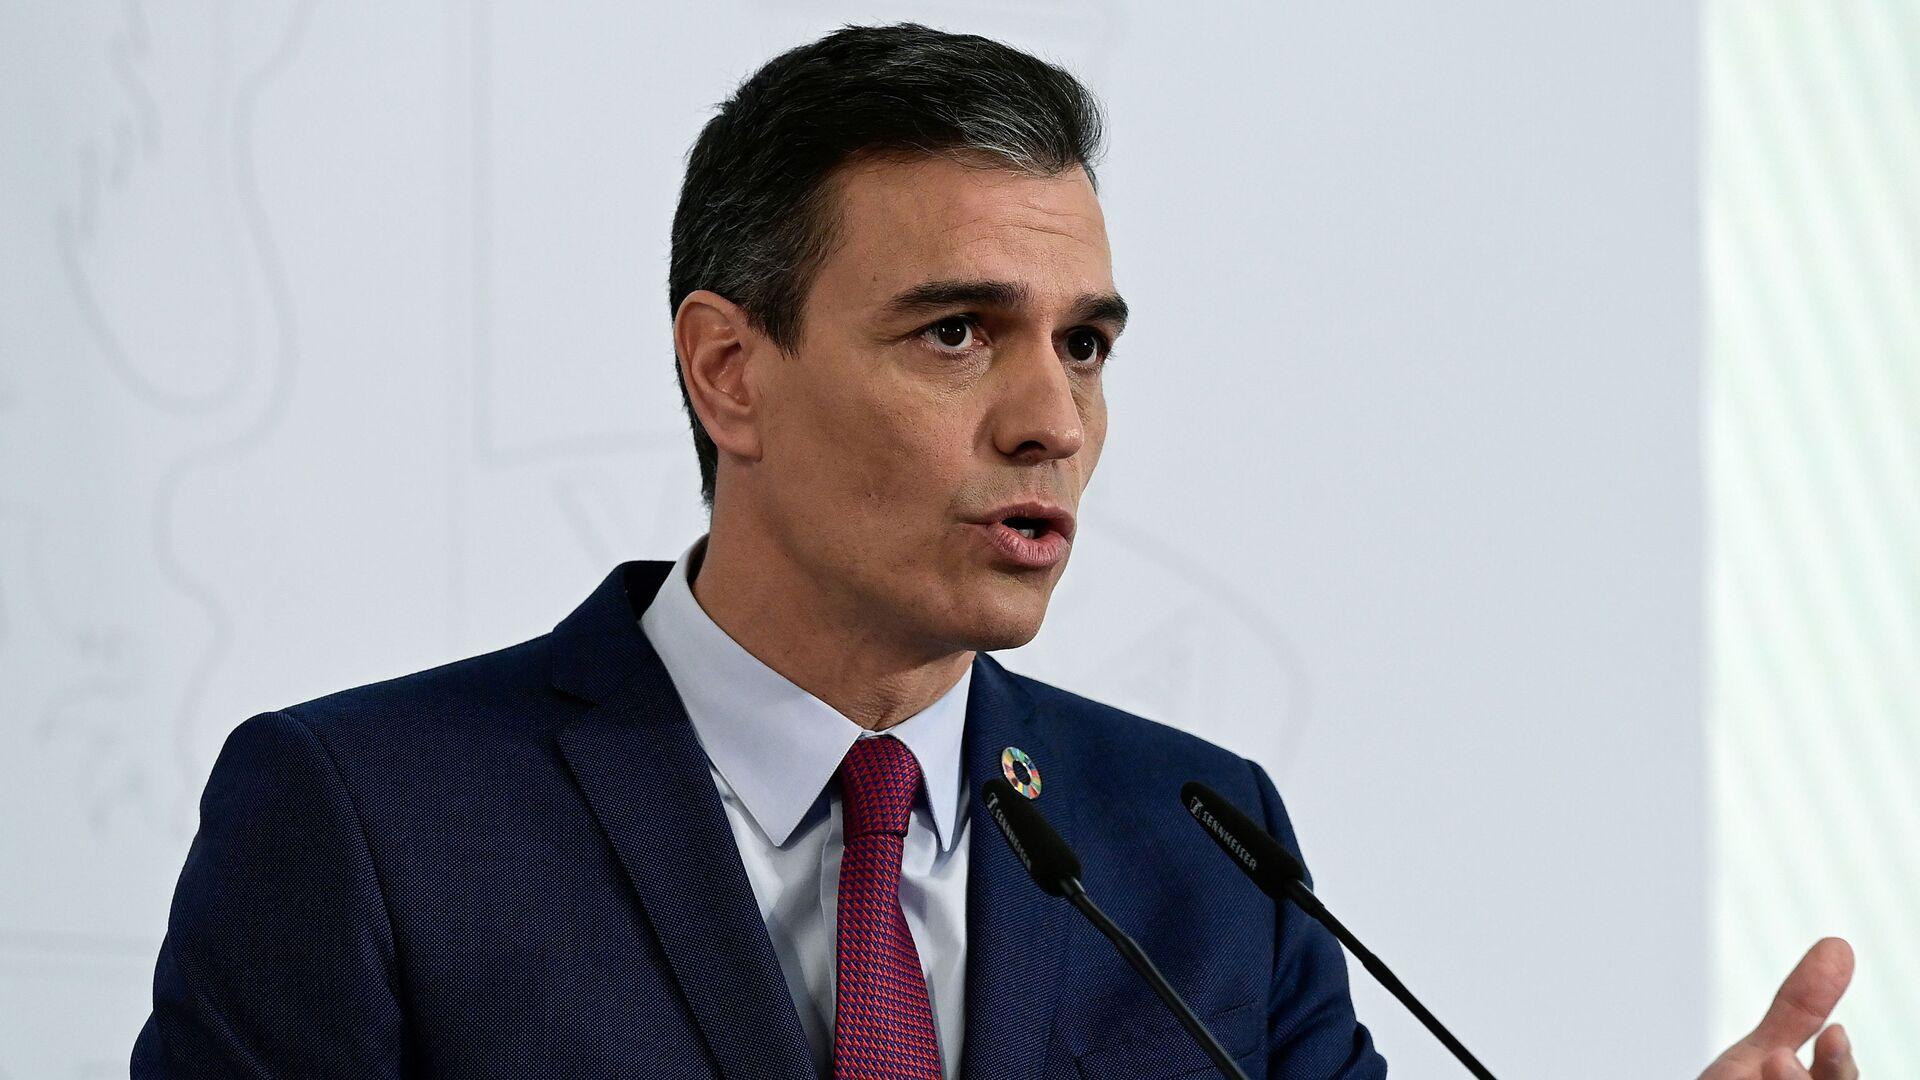 Pedro Sánchez, presidente del Gobierno de España - Sputnik Mundo, 1920, 24.05.2021